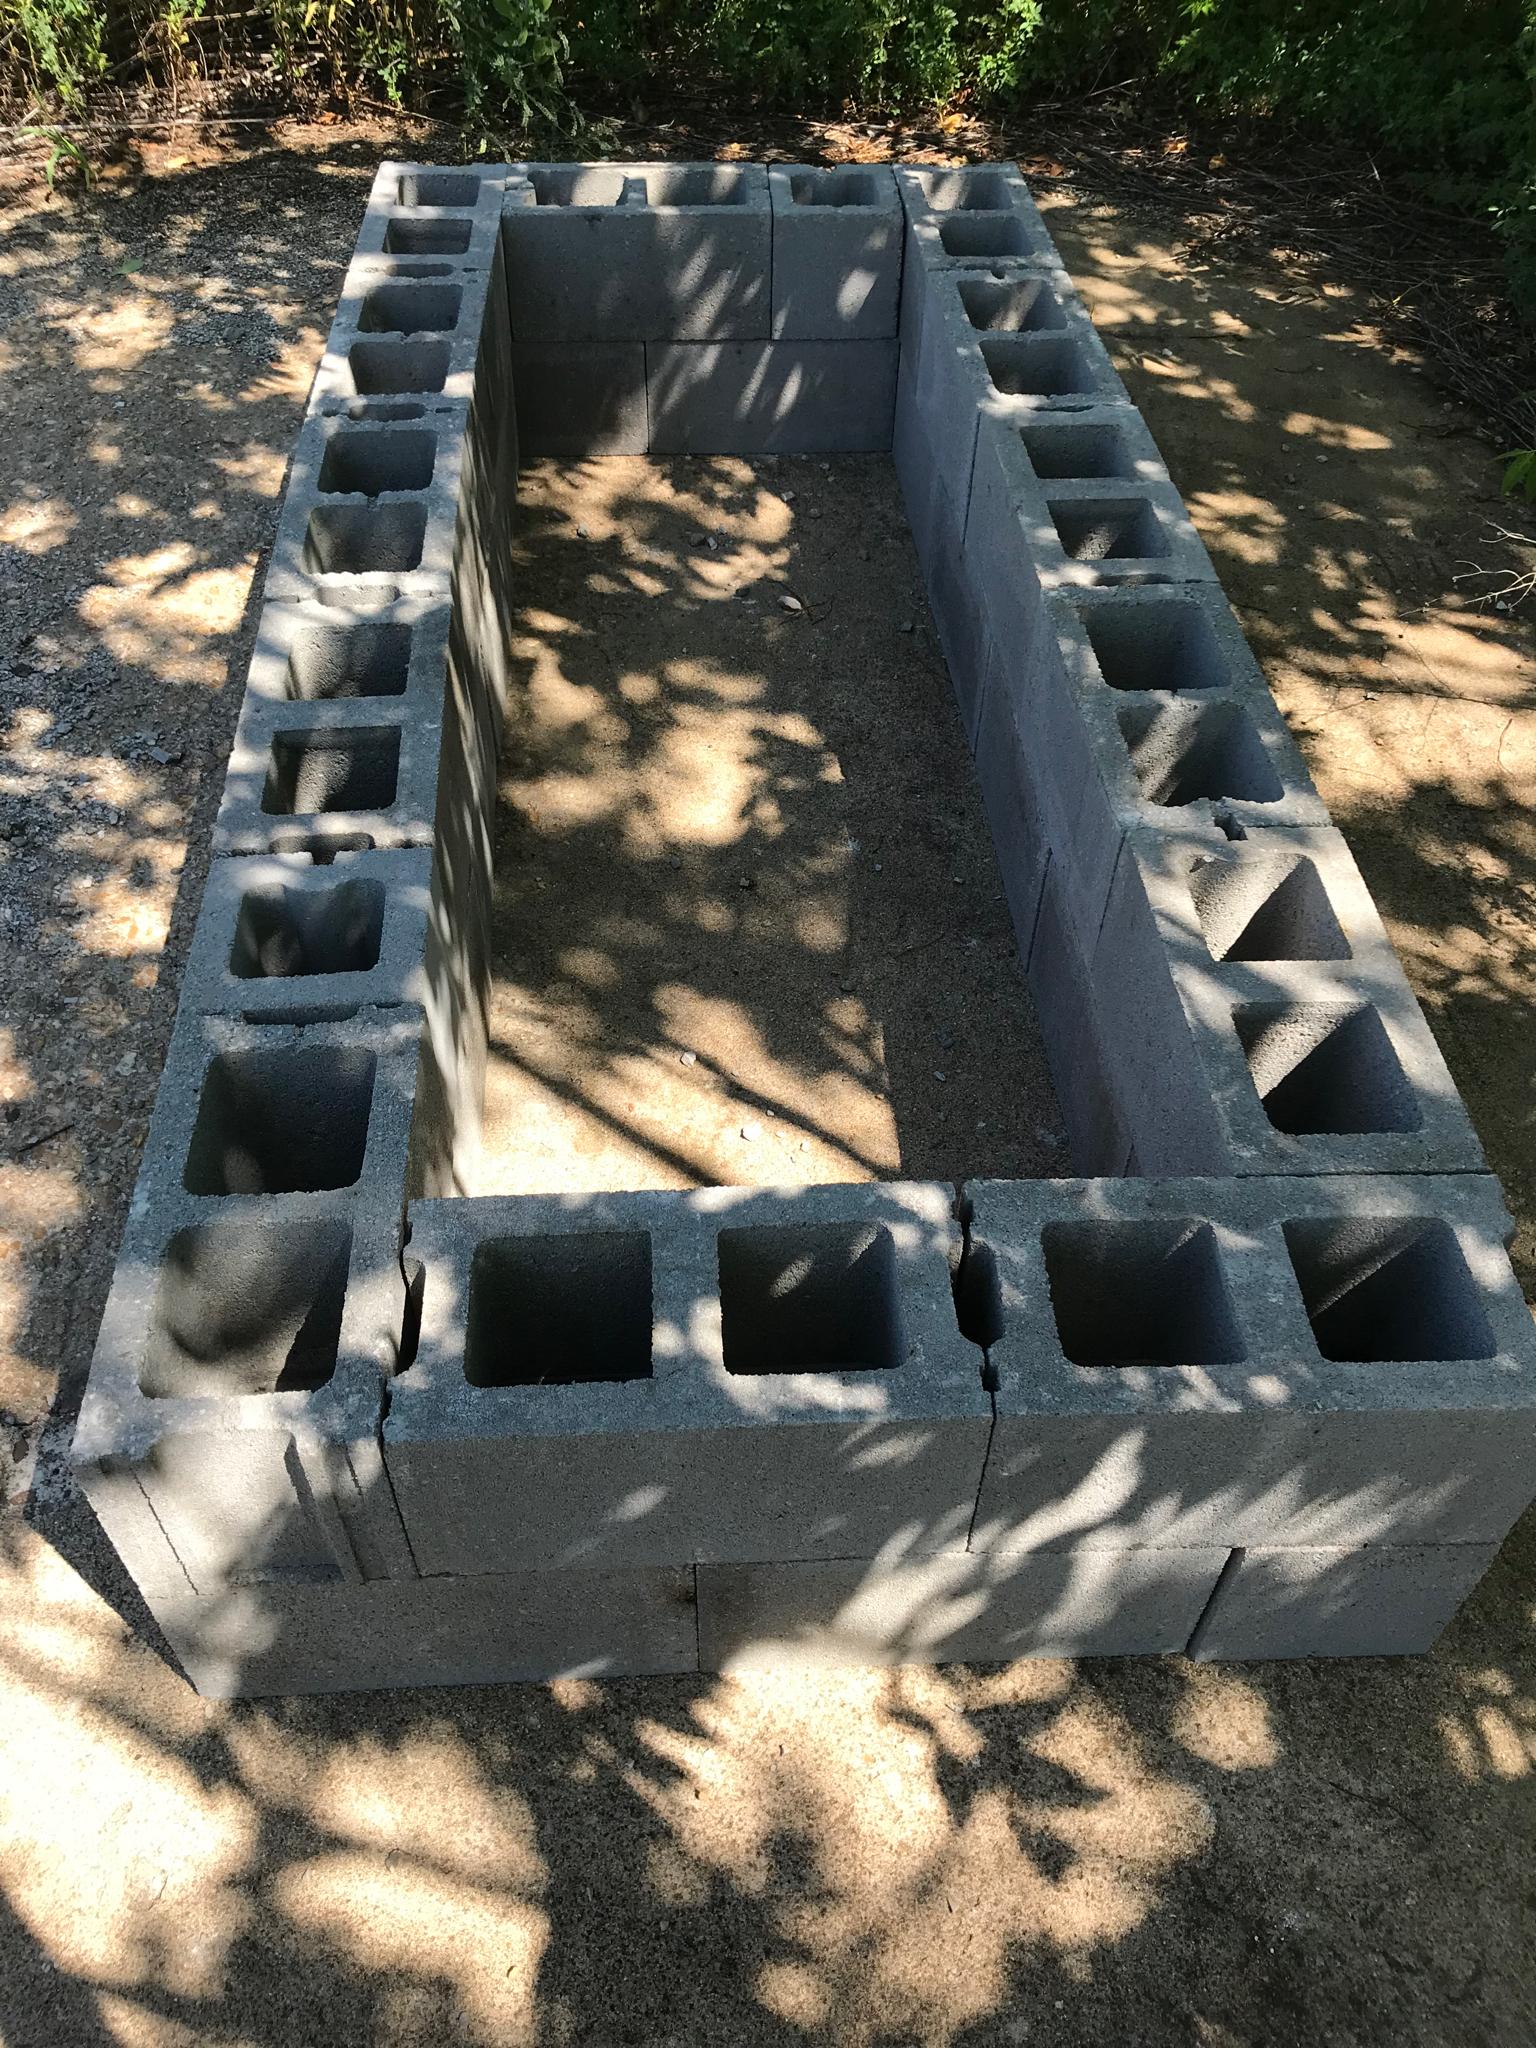 - Cinder block worm bin